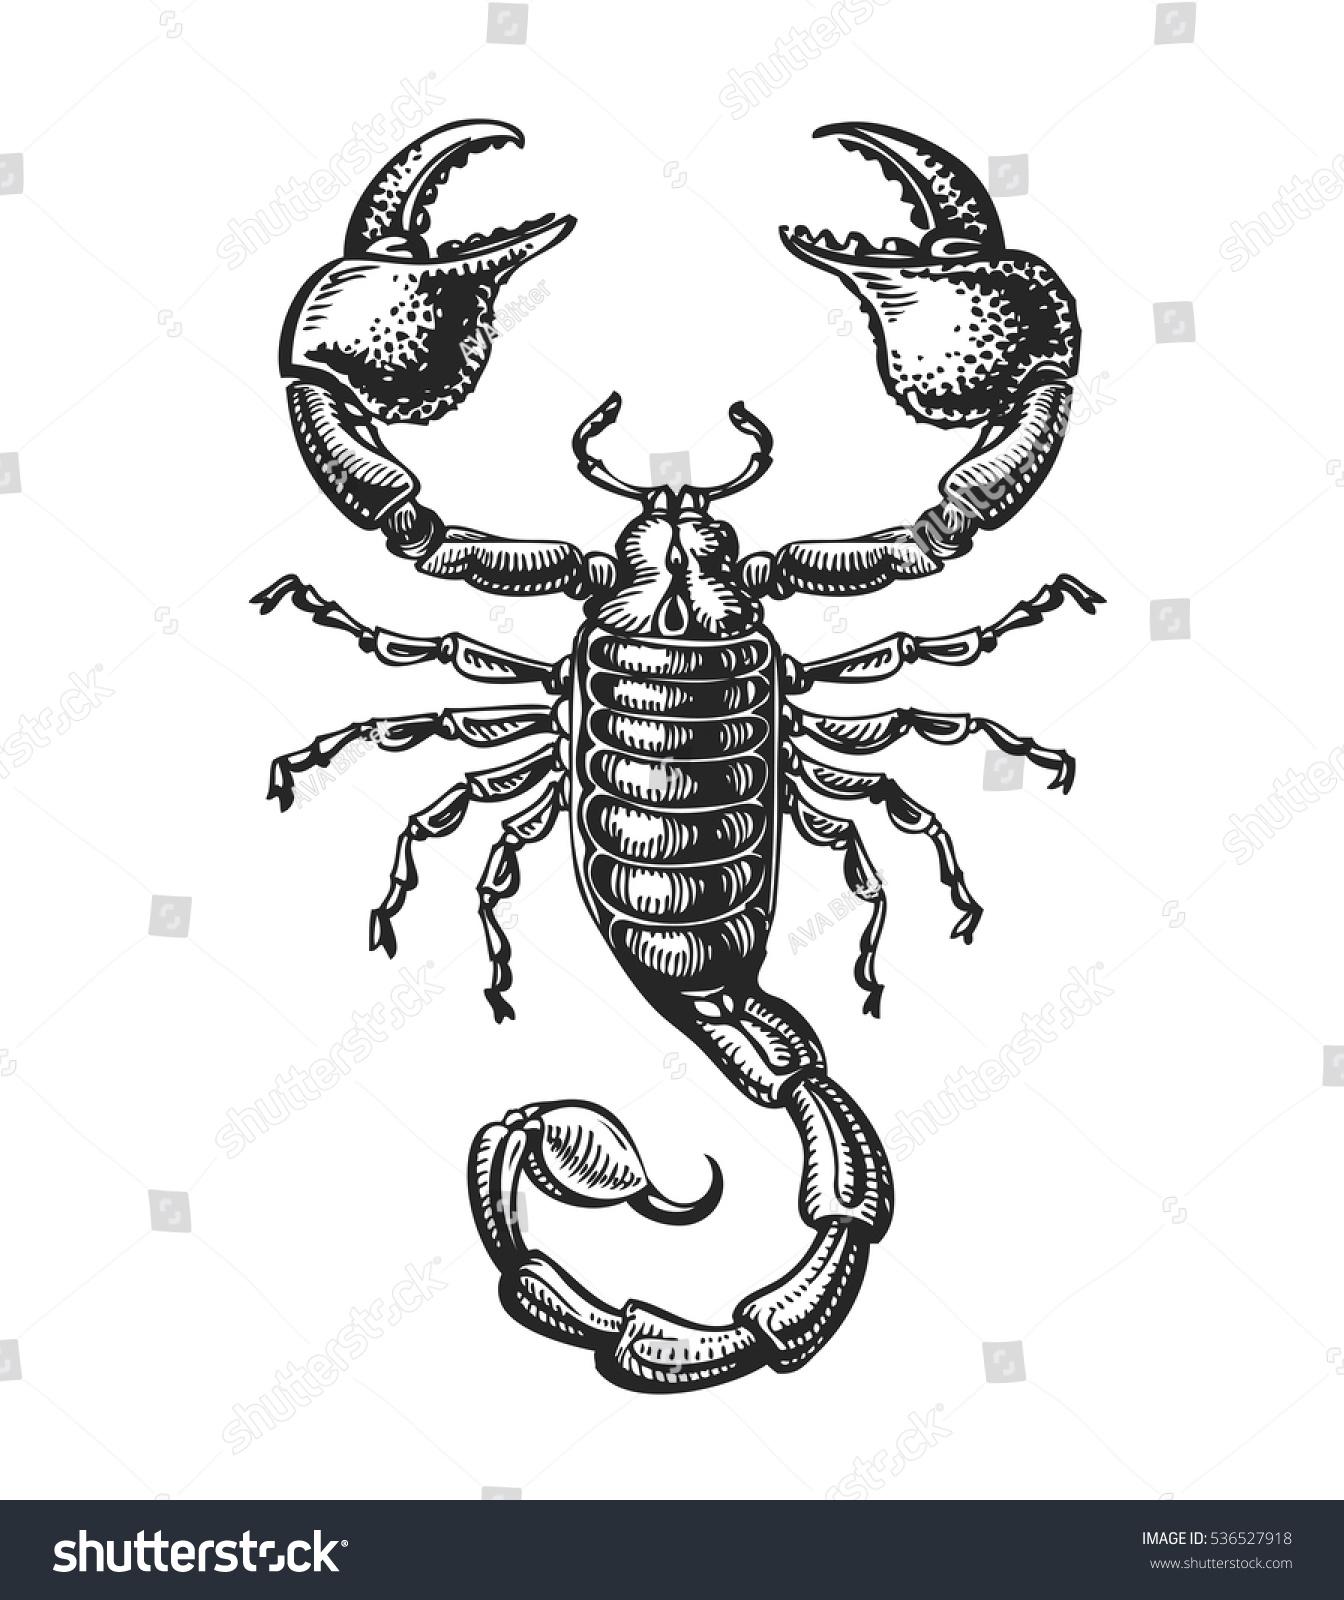 Vintage Venom Tattoo Thoughts: Hand Drawn Sketch Scorpion Tattoo Animal Stock Vector